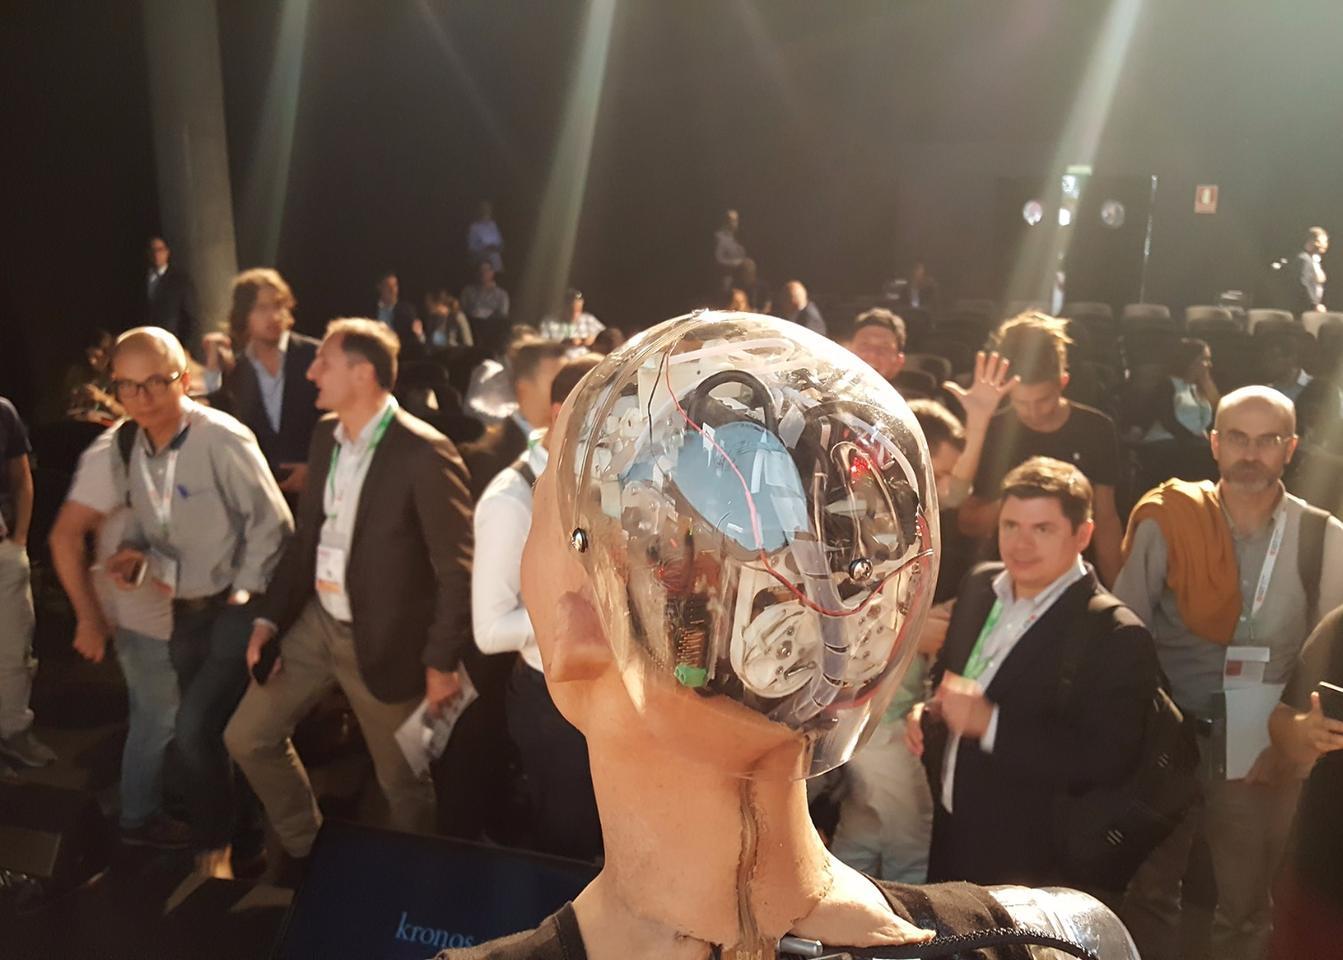 The Sophia robot runs on code created through SingularityNET